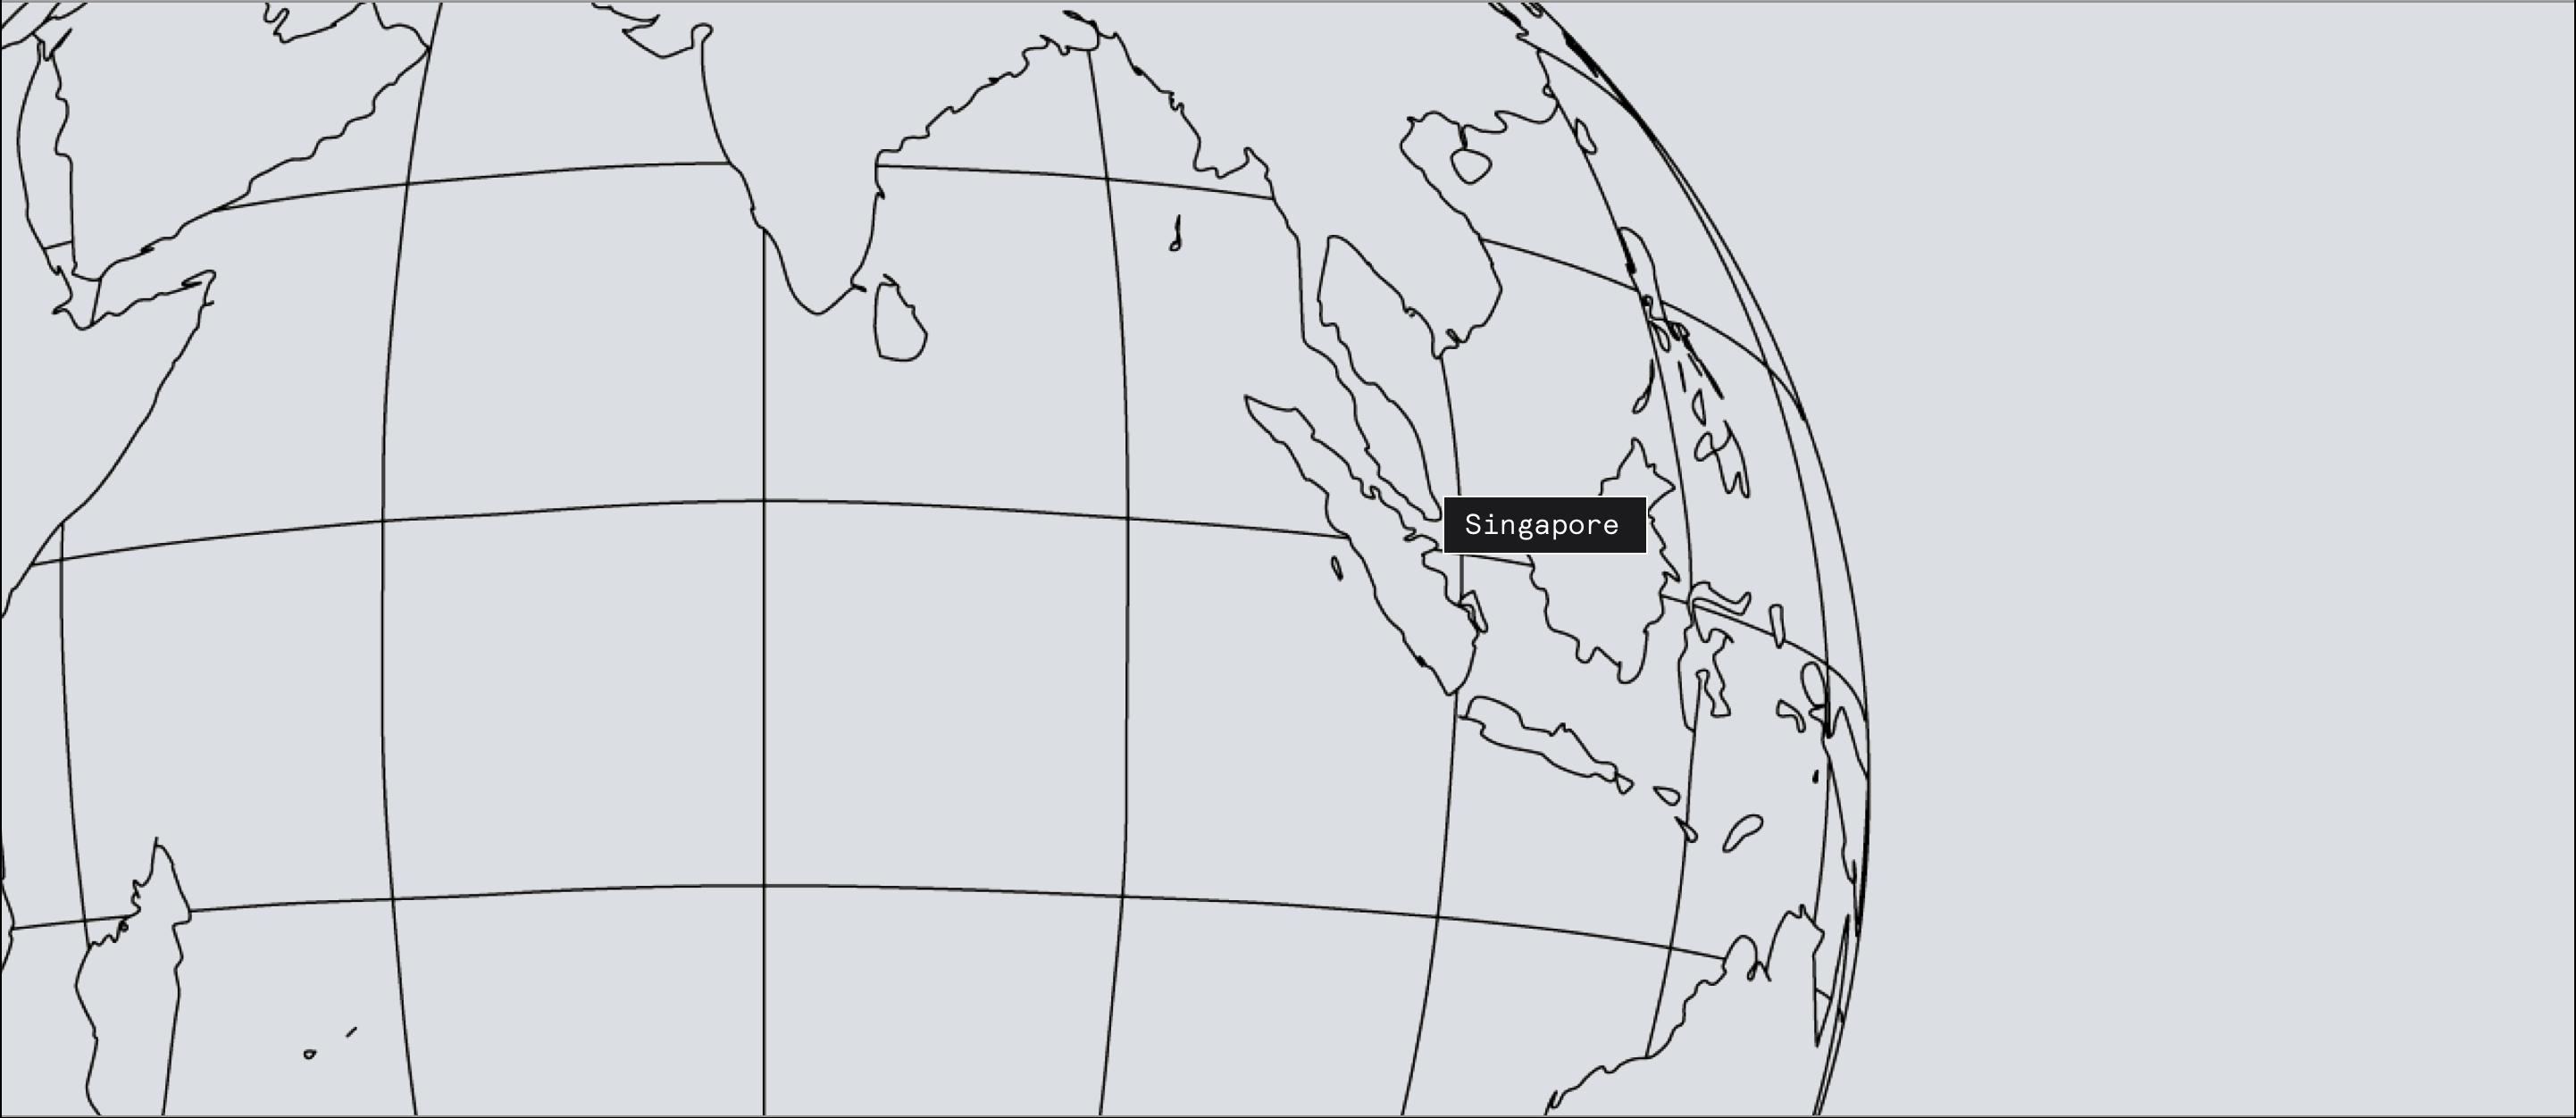 Singapore on map